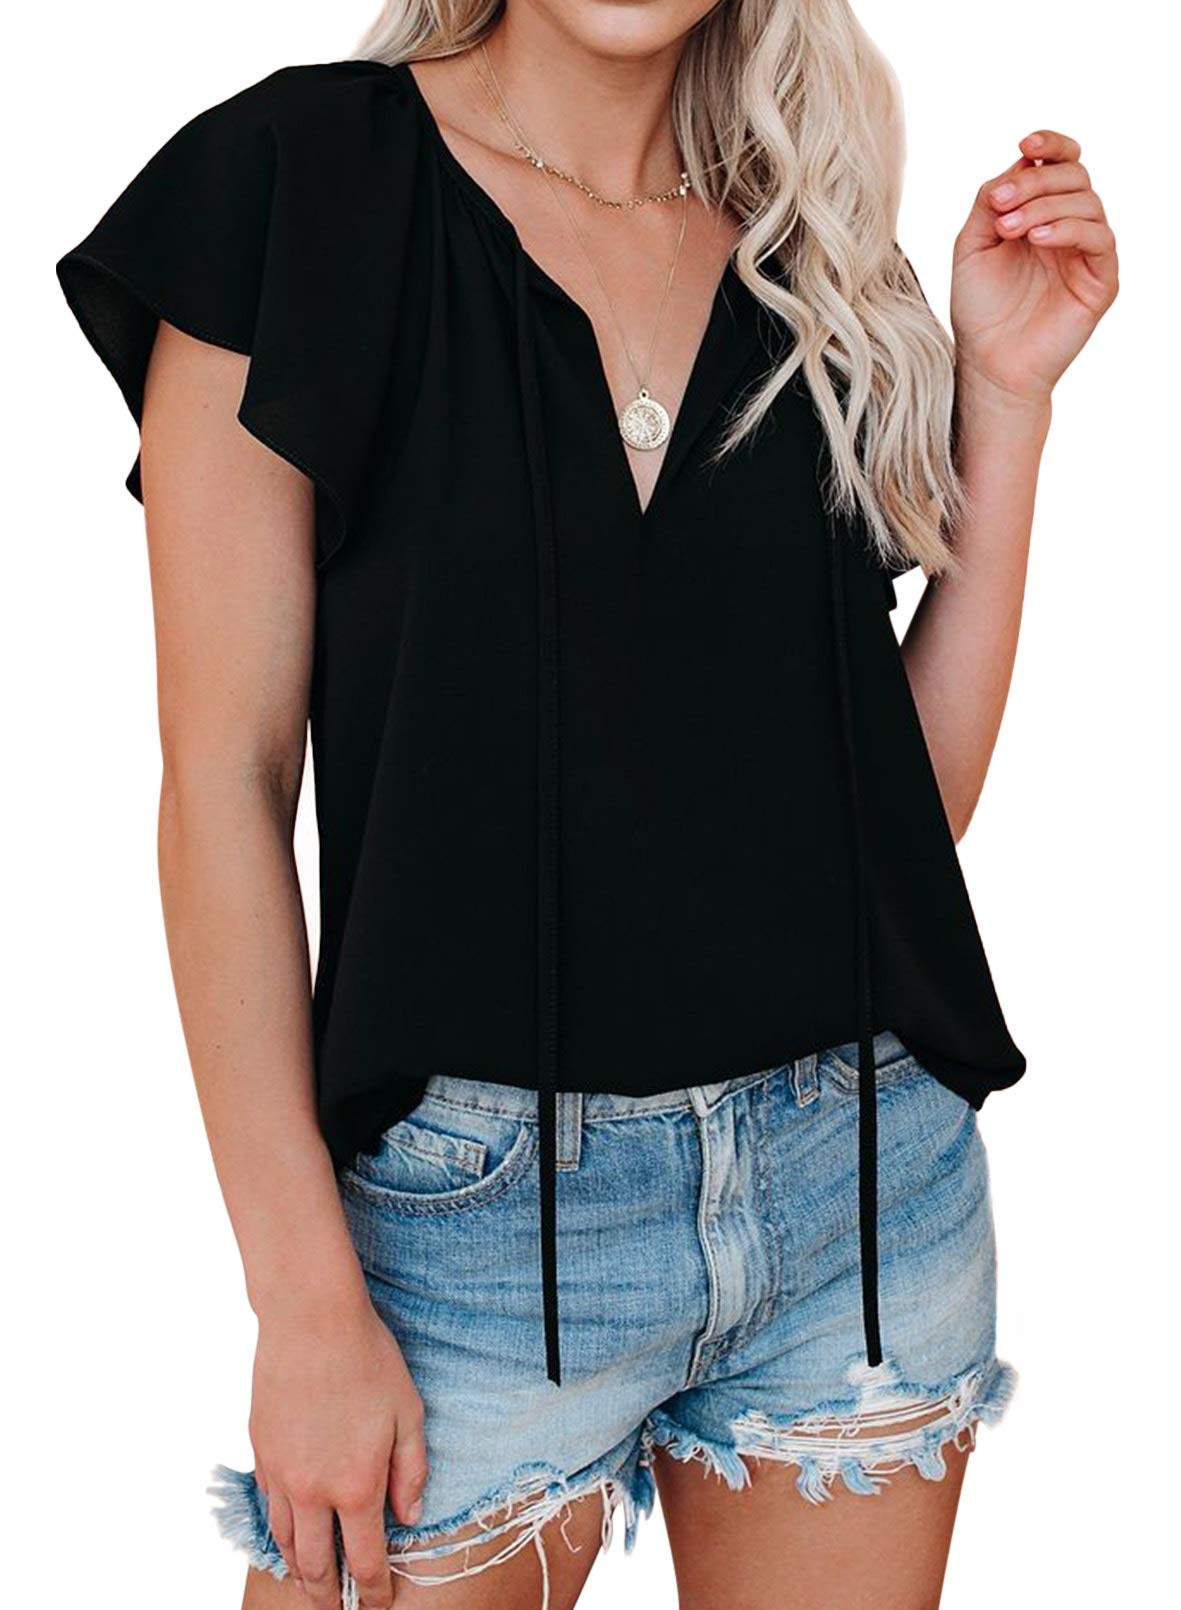 FARYSAYS Womens Summer Basic Short Sleeve Crew Neck T Shirt Casual Tops